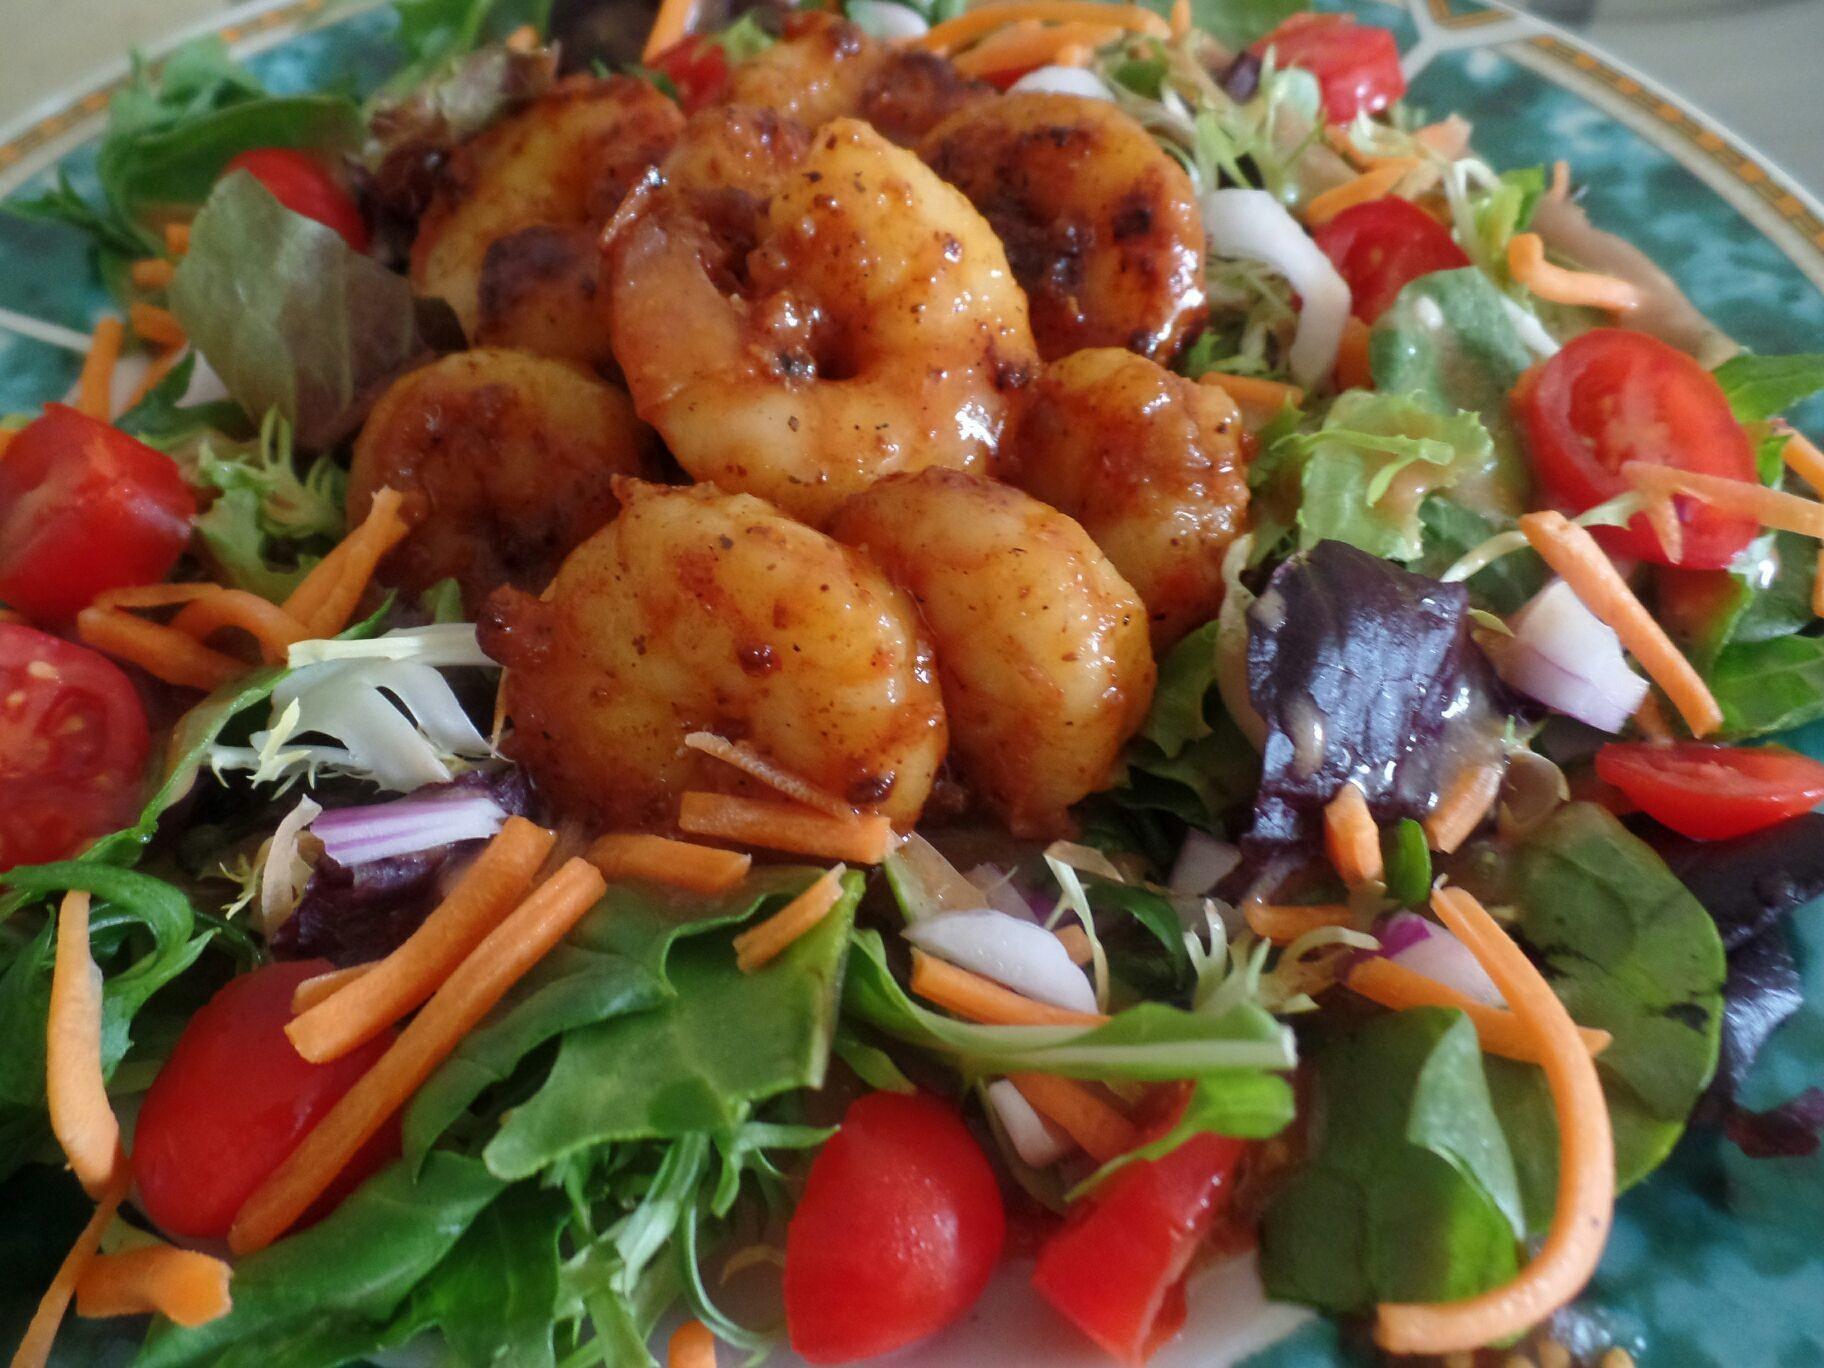 The best bbq shrimp salad ever!! #ilovesalad #iloveshrimp #foodpic #foodgasm #foodporn #foodie #foodpedia #foodhunter #foodbloggers #eatwell #eathealthy #healthyeats #healthyfood #healthyeating #healthyfoods #realfood #detroitfoodnetwork #detroitfoodie #detroitfoodies #detroitfood #delish #delicious #deliciousfood #deliciousfoods #deliciousness #instafood #foodnetwork #owntv #wholefoods